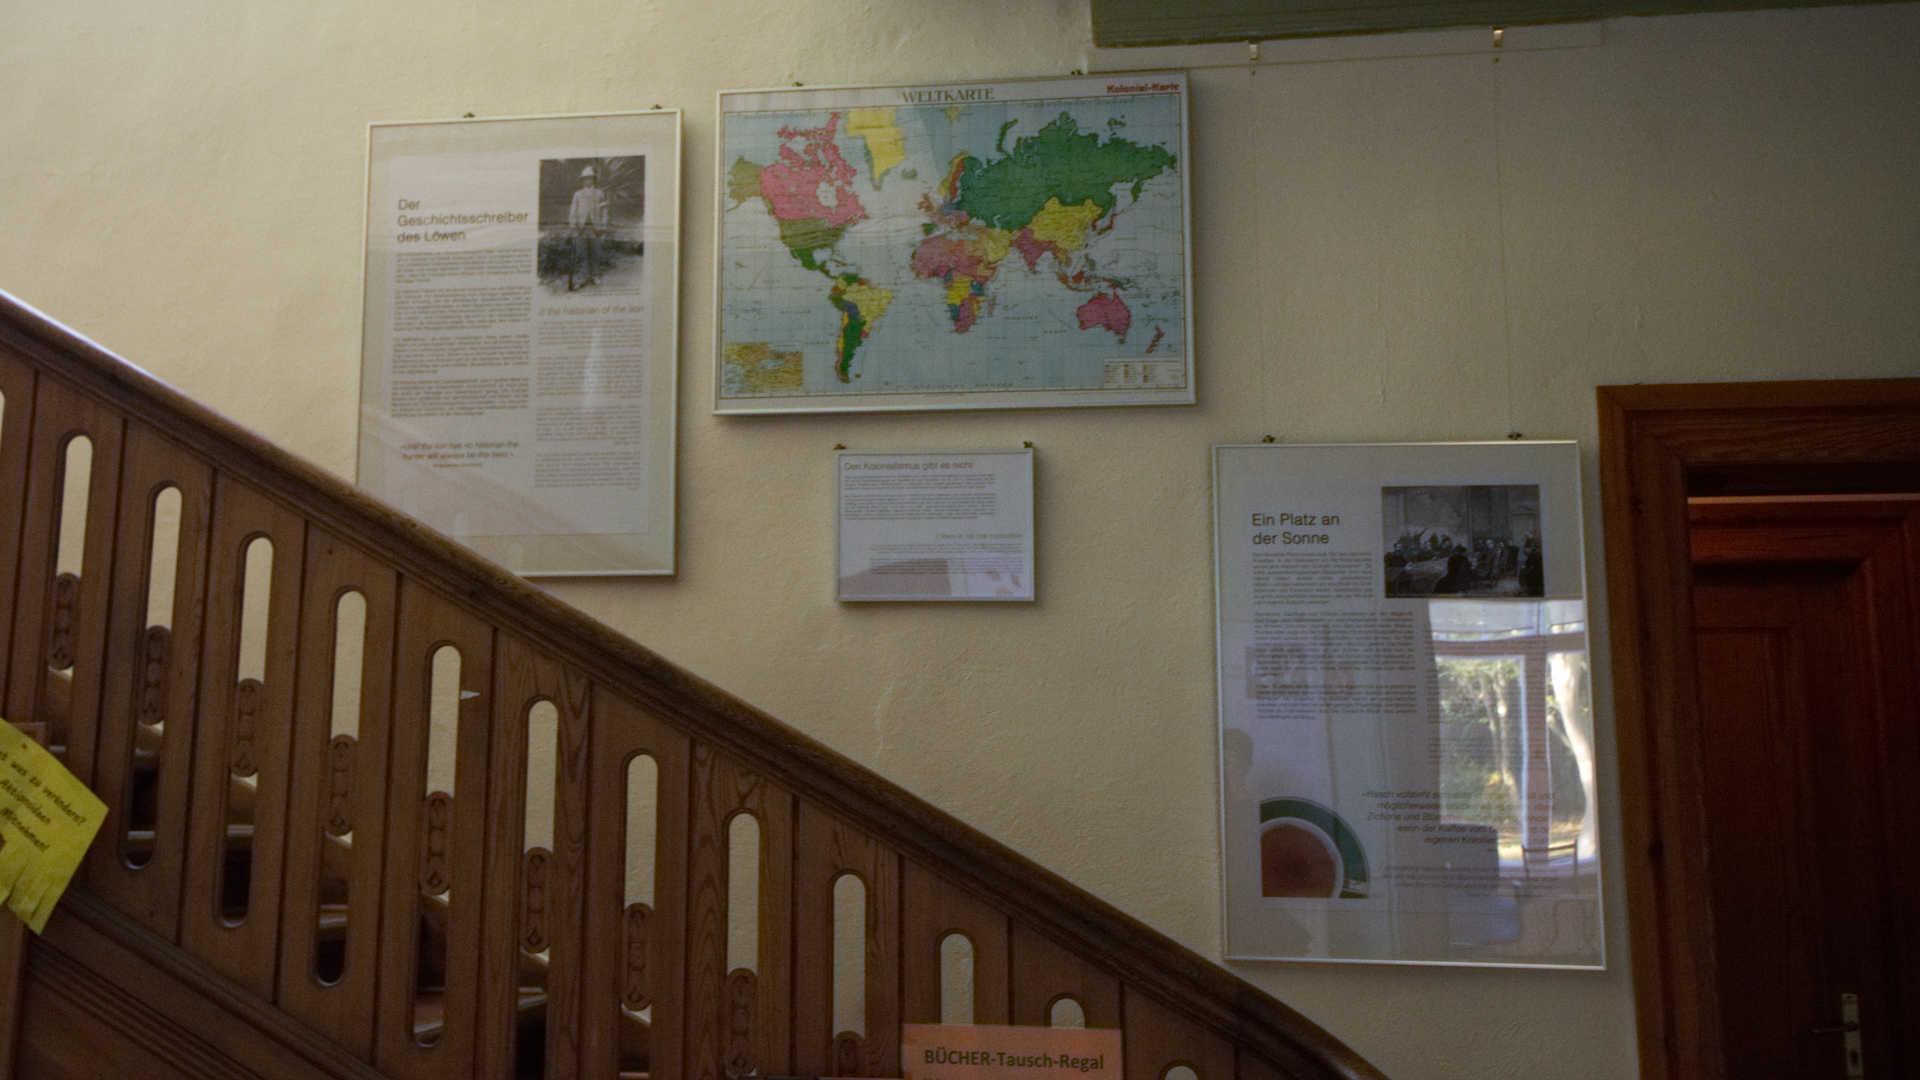 Kolonialwaren als Ideologie im Ökohaus